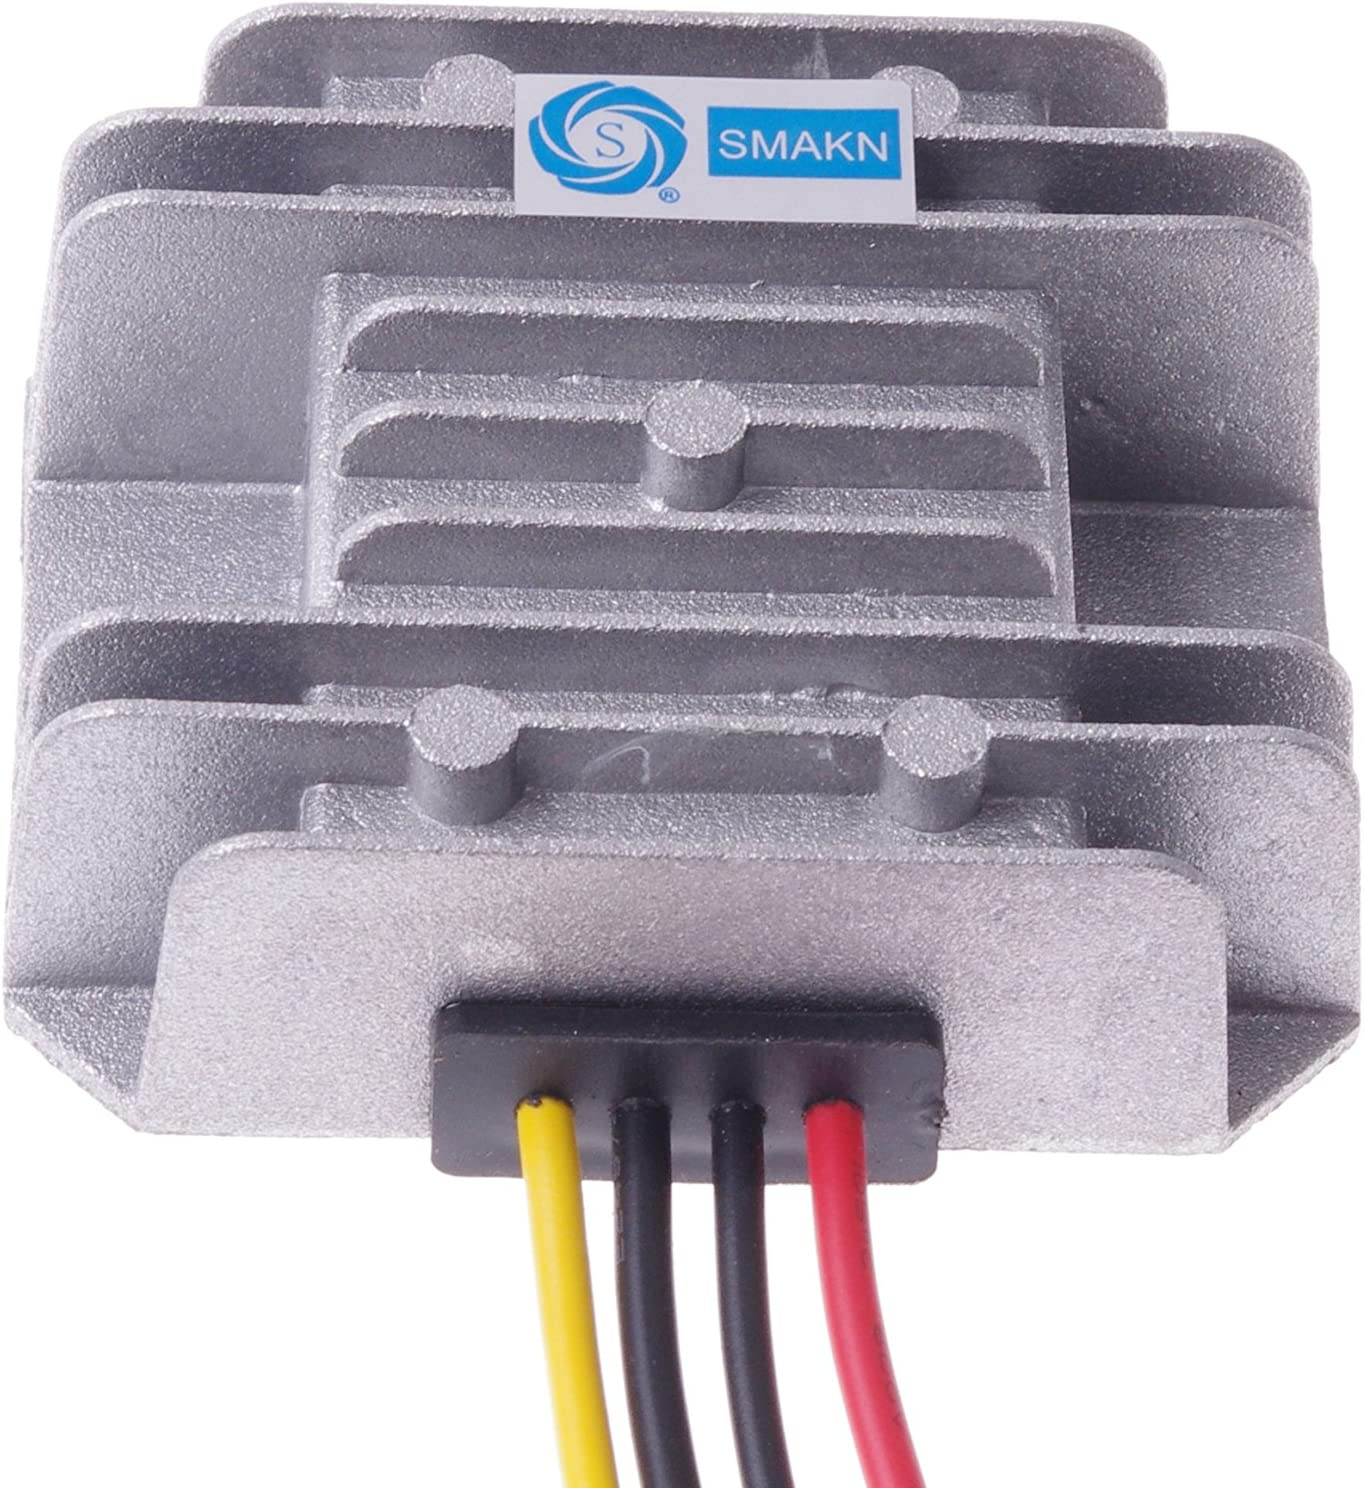 SMAKN DC-DC Voltage Step-Down Converter Buck Module 36V/48V/60v to 24V 3A 72W Car LED Power Converter Waterproof